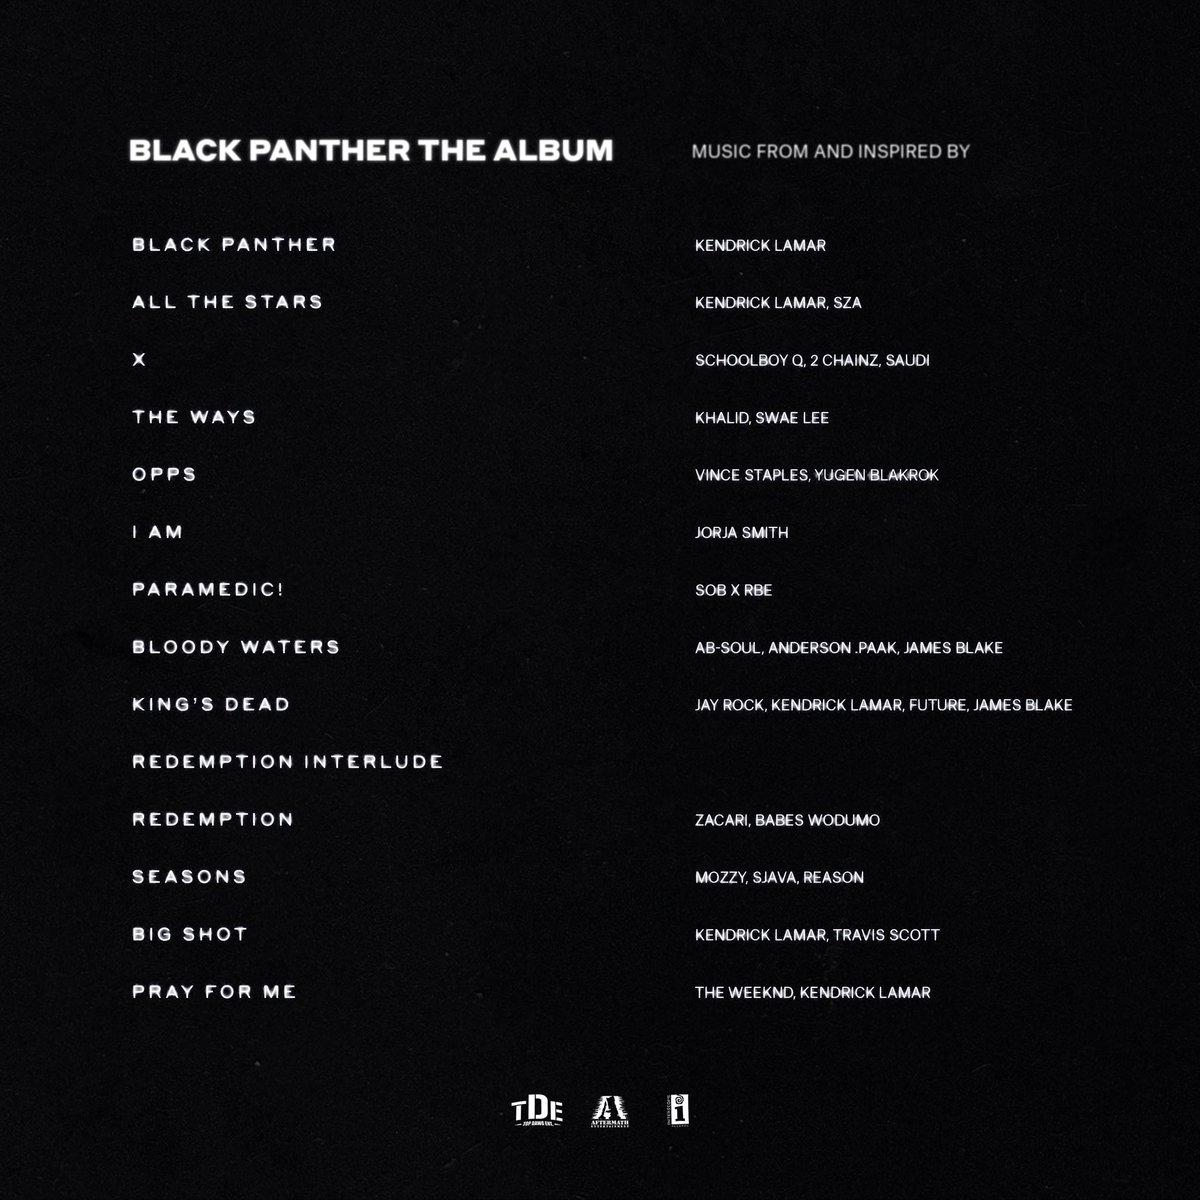 Black Panther: The Album